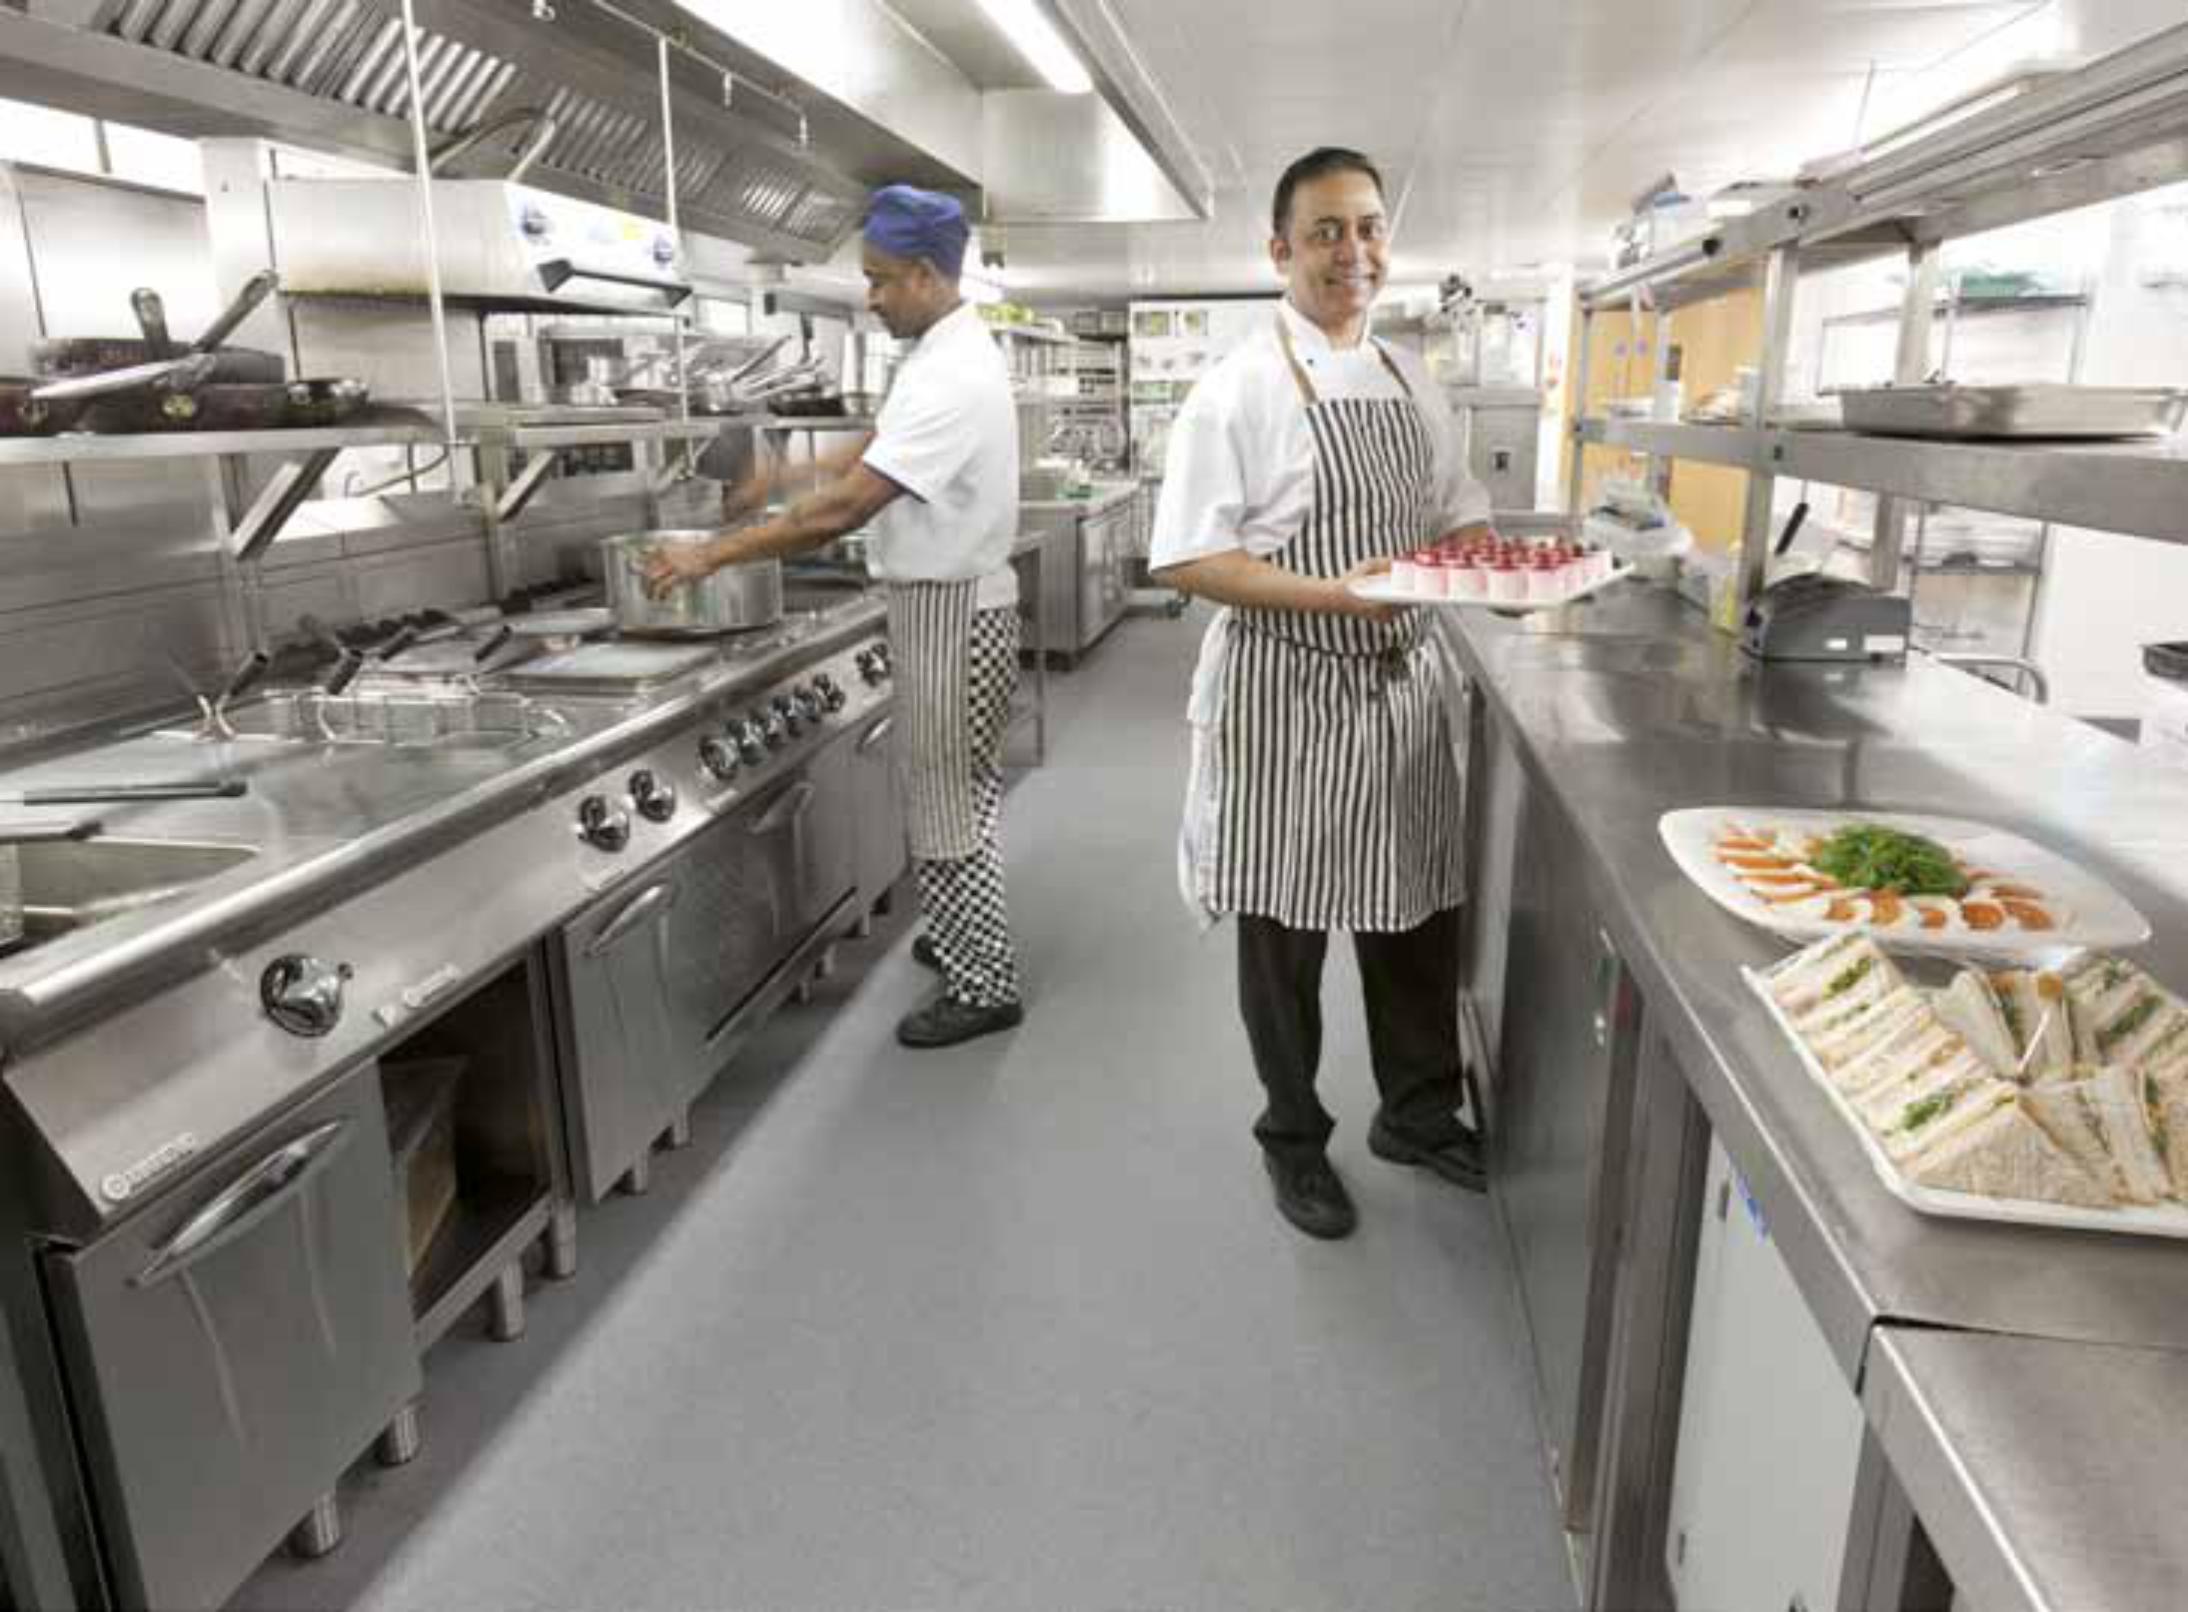 ns-flooring-bristol-limited-radisson-blu-hotel-kitchen-altro-flooring